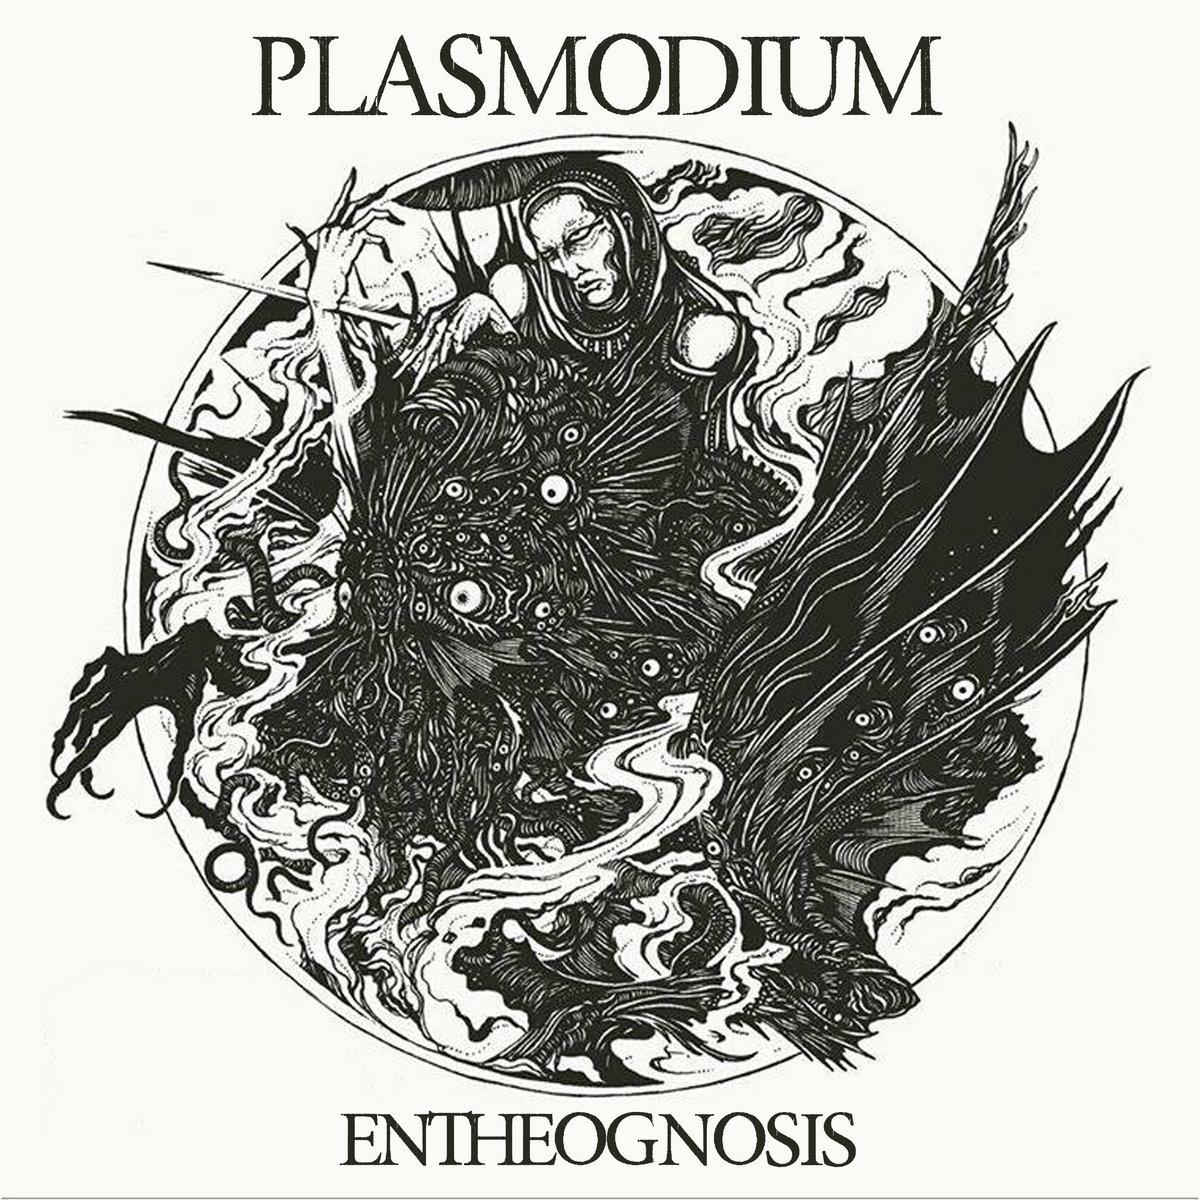 https://plasmodium-ritual.bandcamp.com/releases